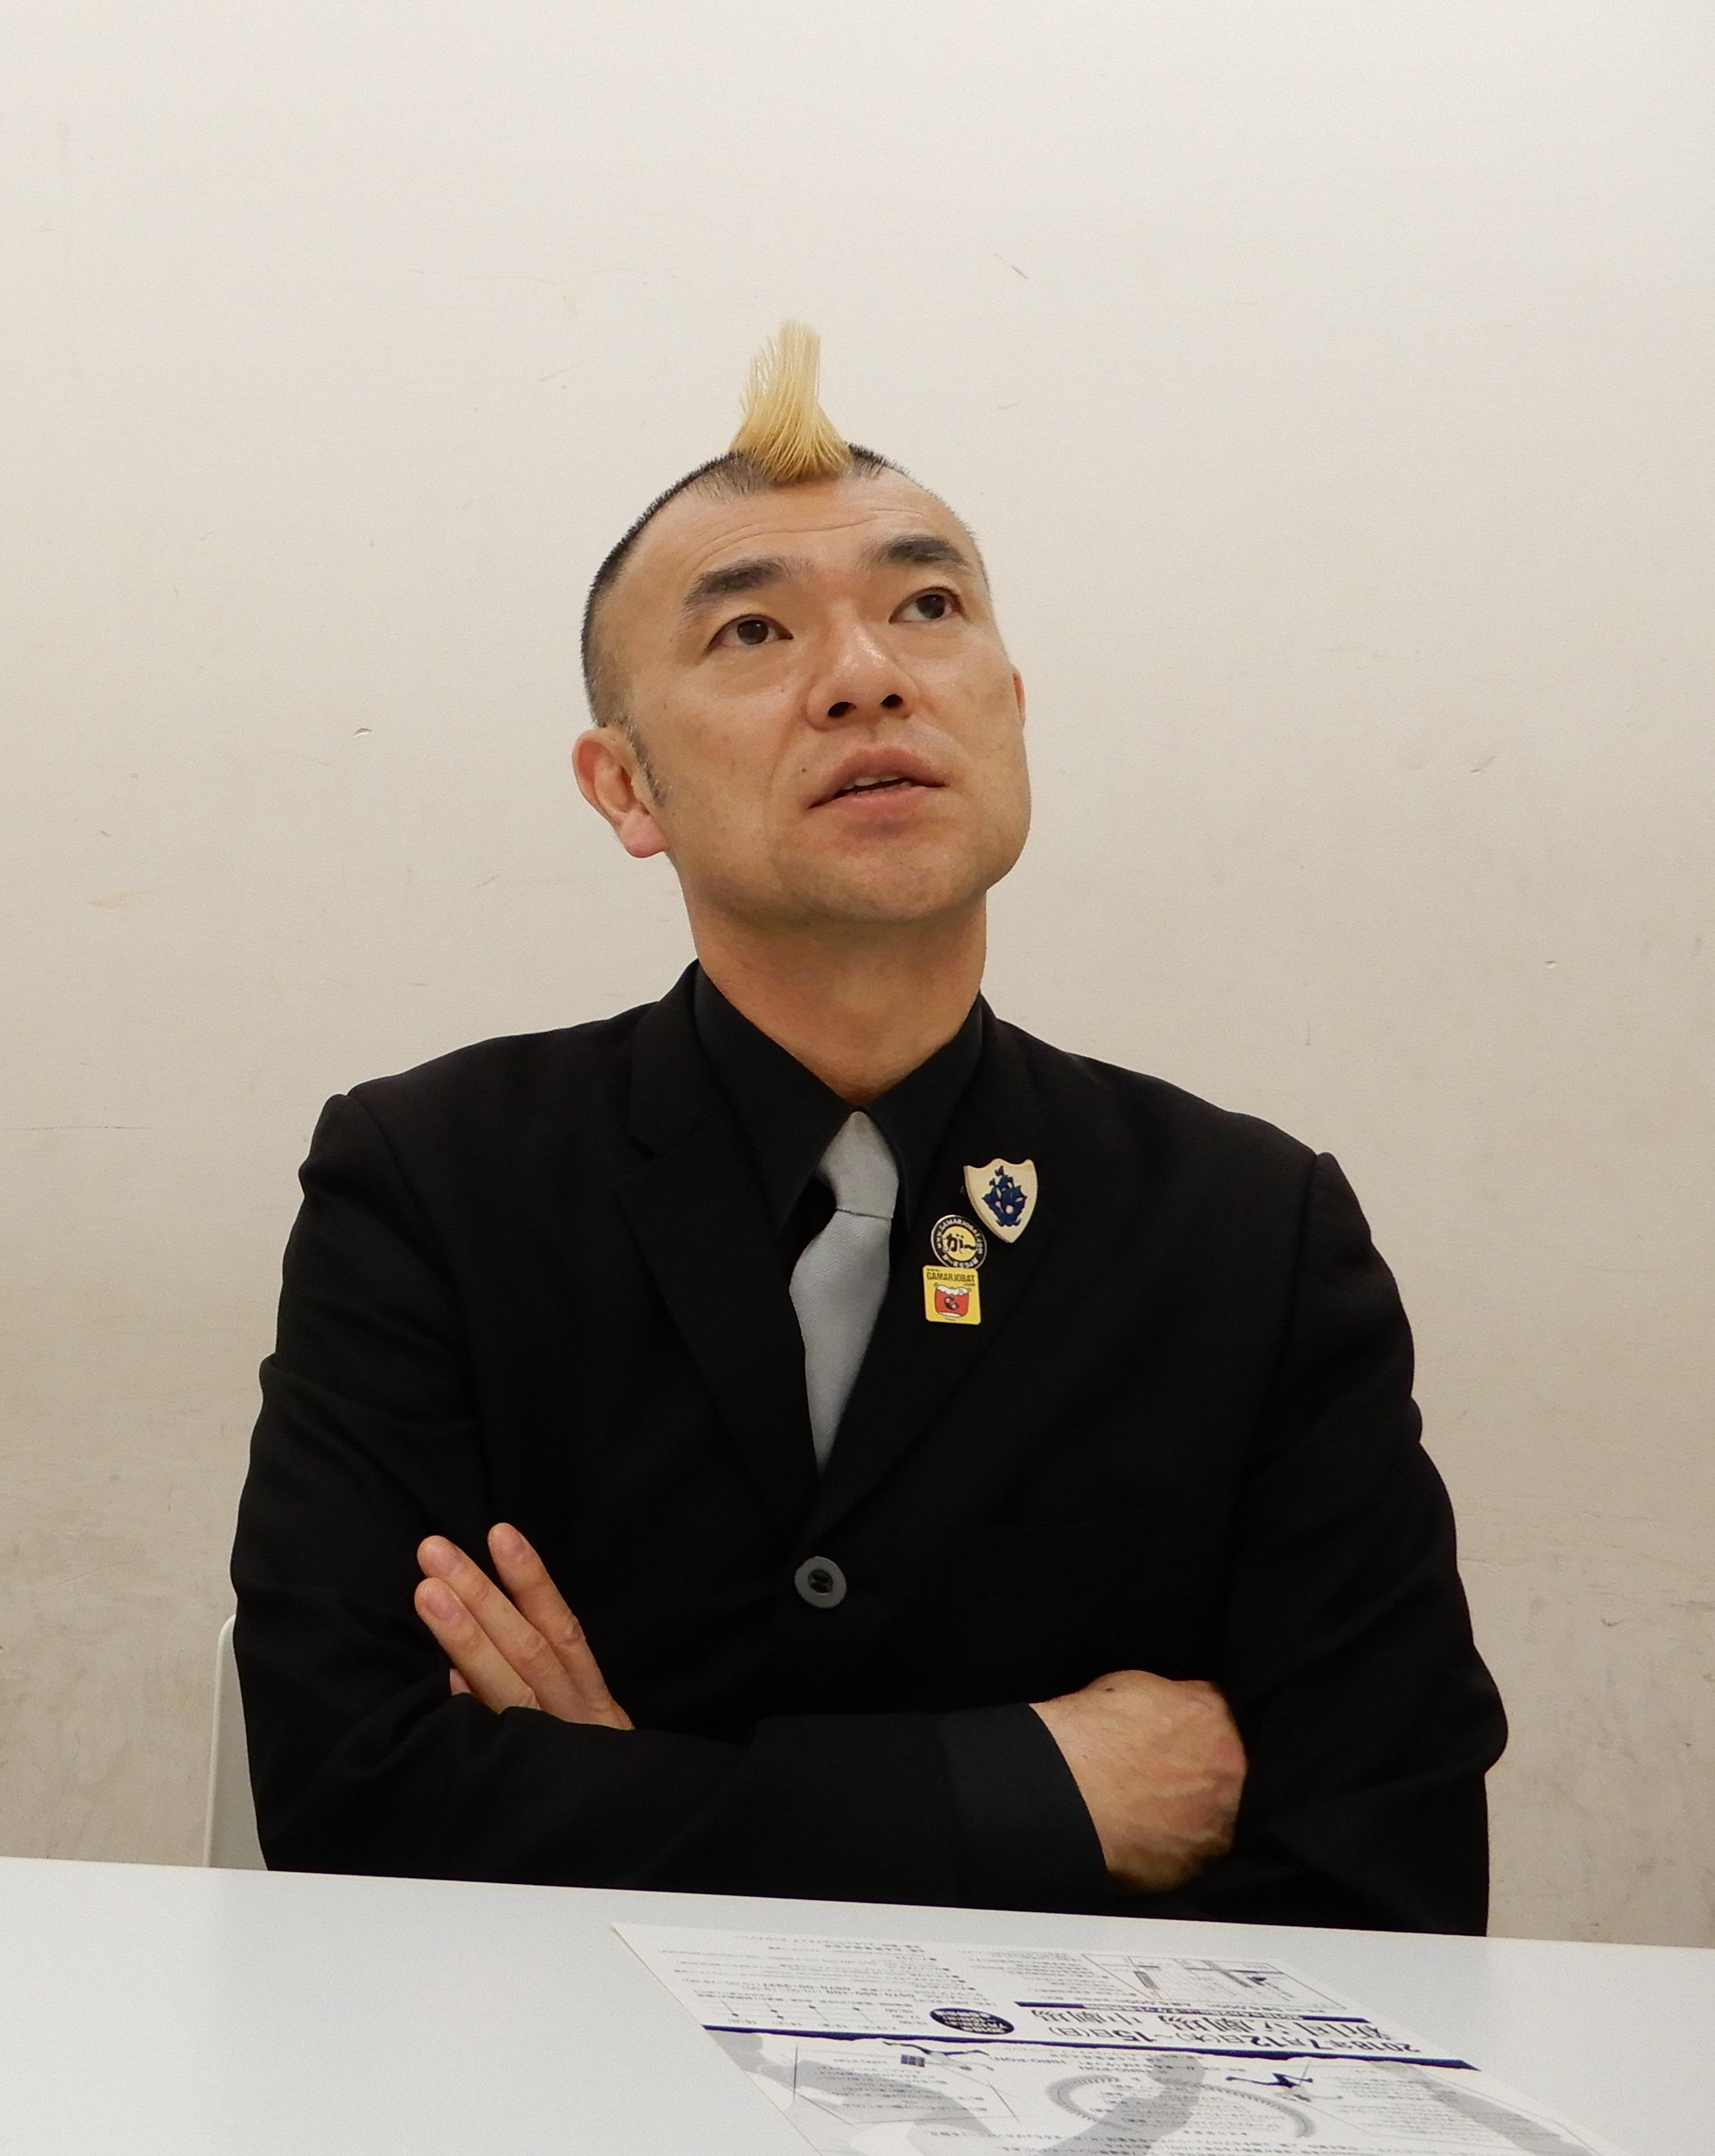 http://news.yoshimoto.co.jp/20180601153034-cfada99c8f94243635f54a064af3ee7f02ec0996.jpg